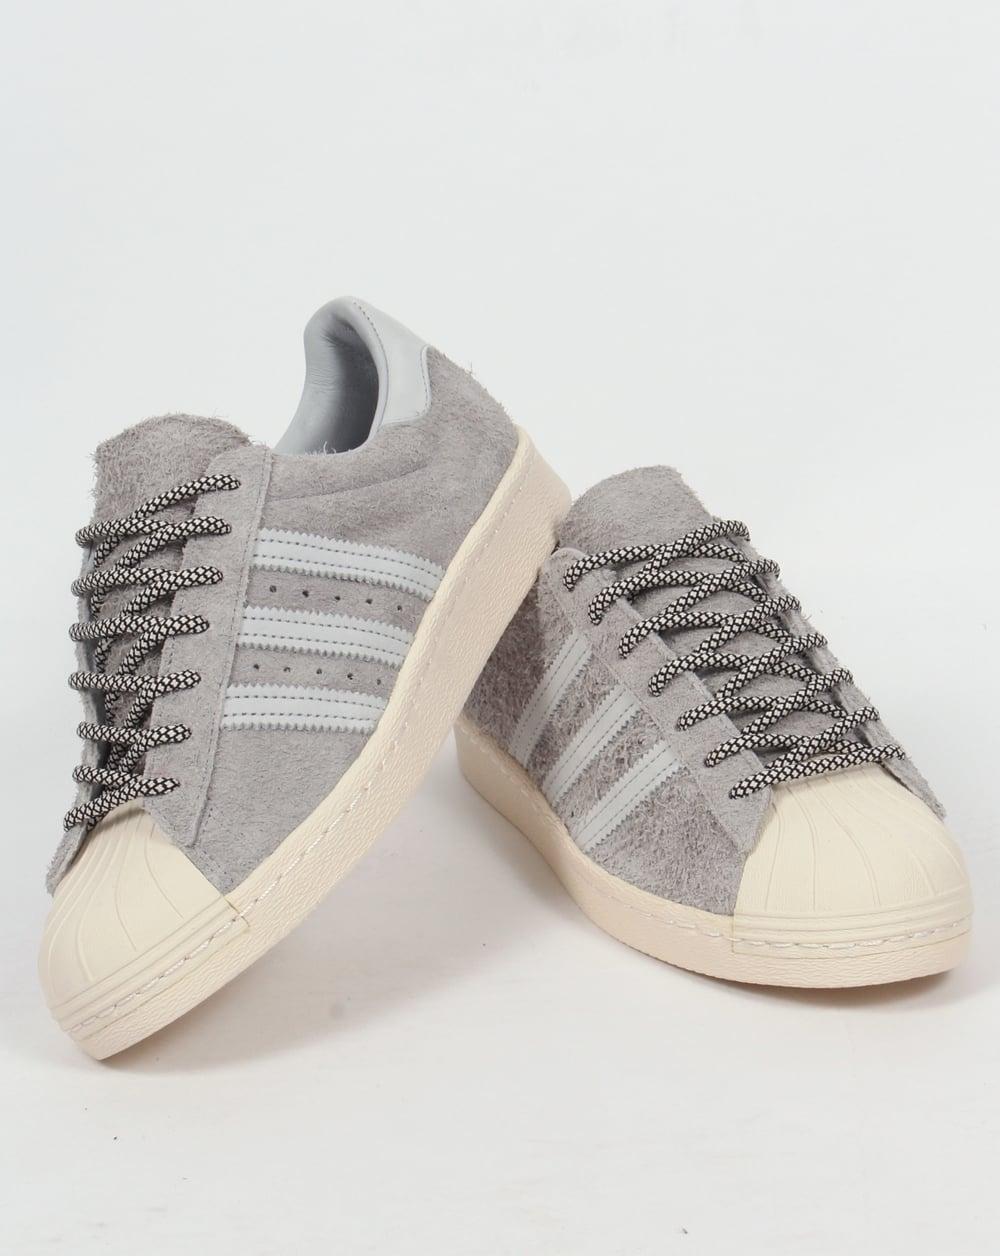 Grey Adidas Superstar 2d2c1 3dcba 80s Usa orEdCQxeWB